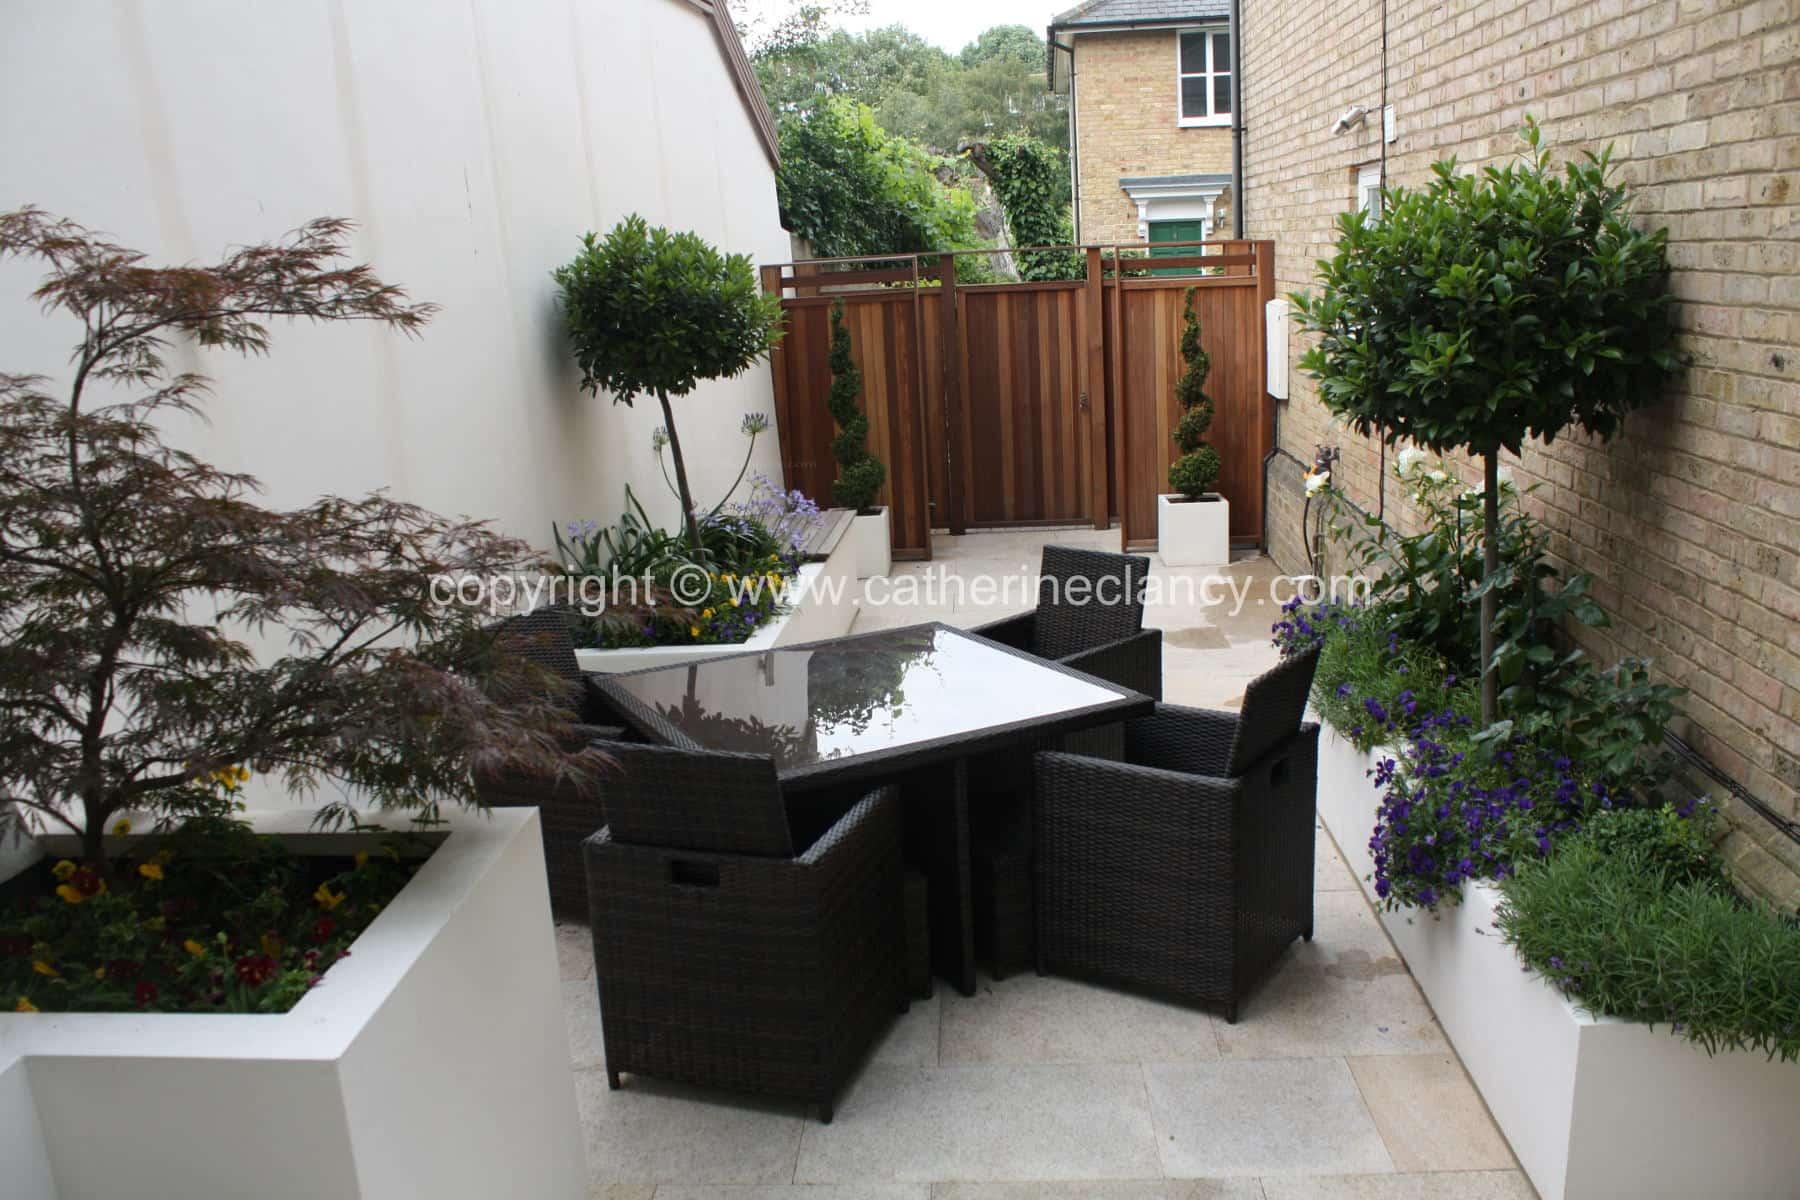 chic-courtyard-1